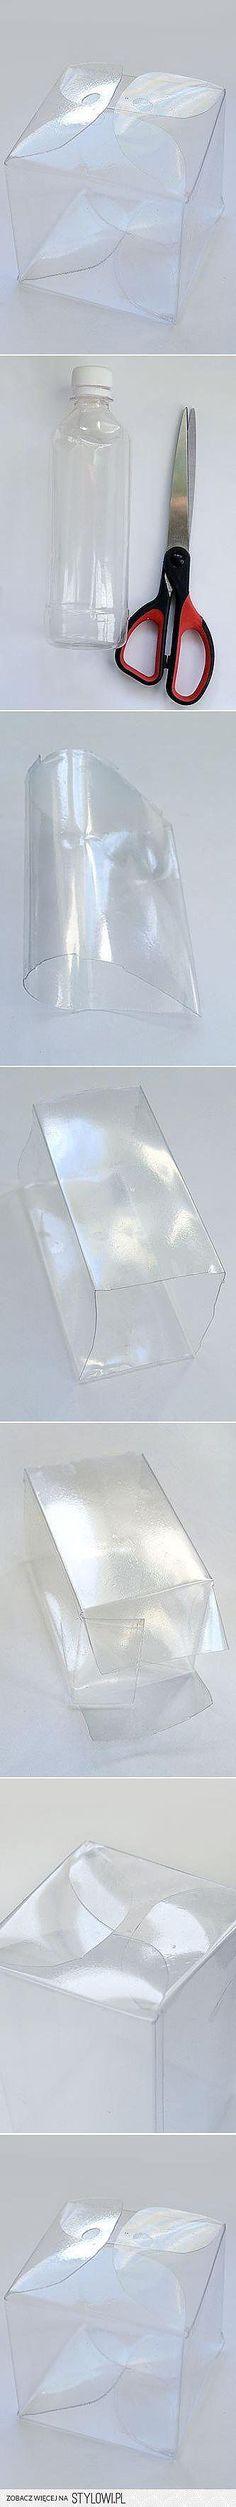 Коробочка из пластиковой бутылки